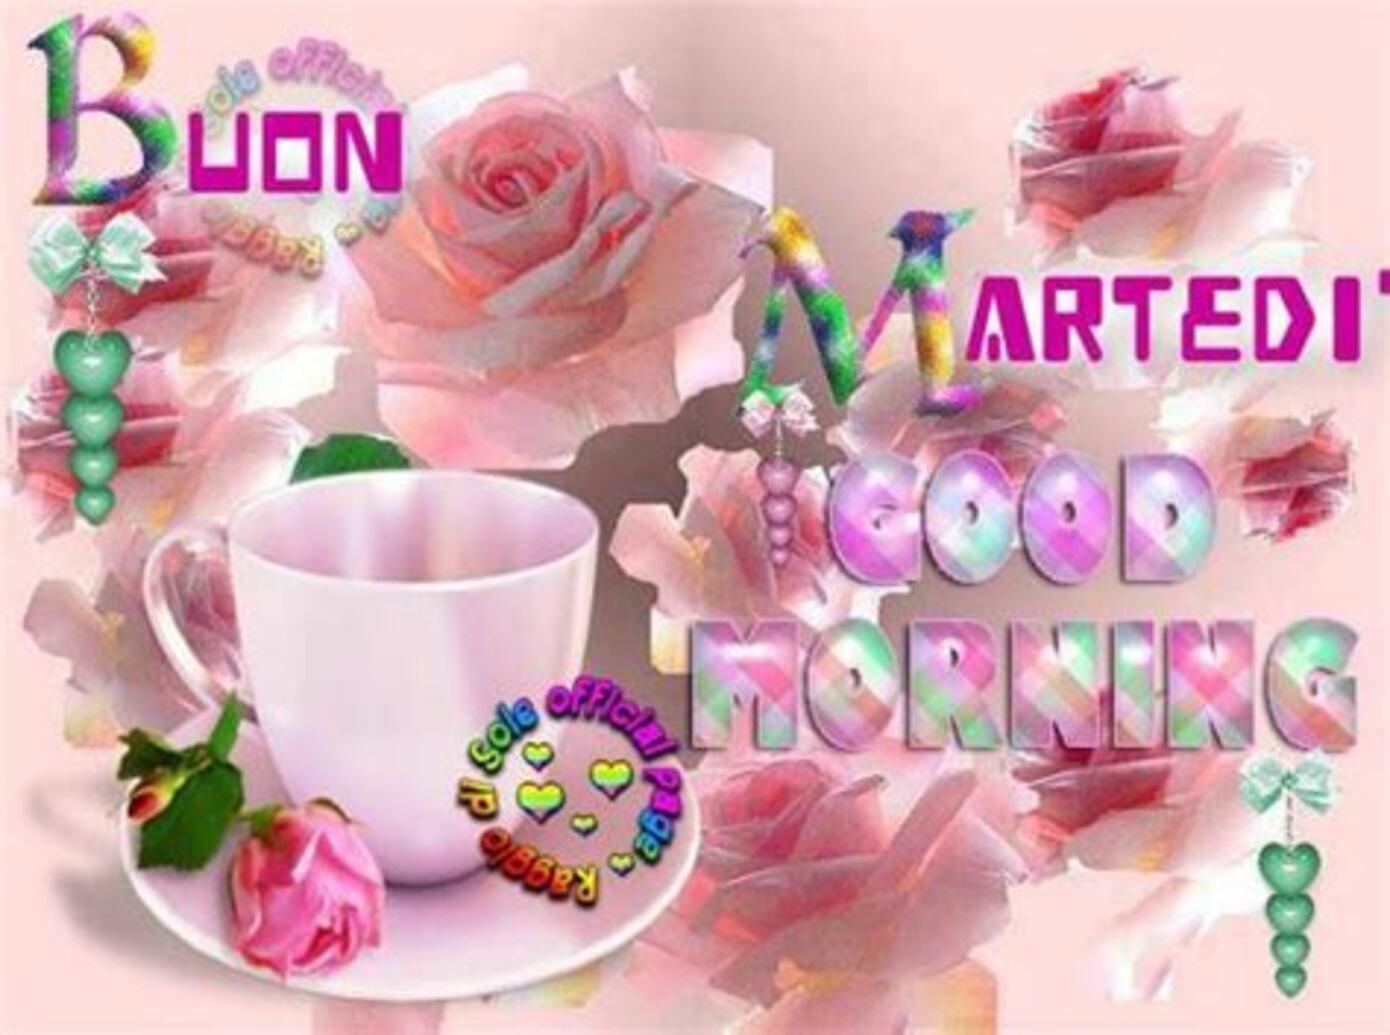 Buon Martedì Good Morning